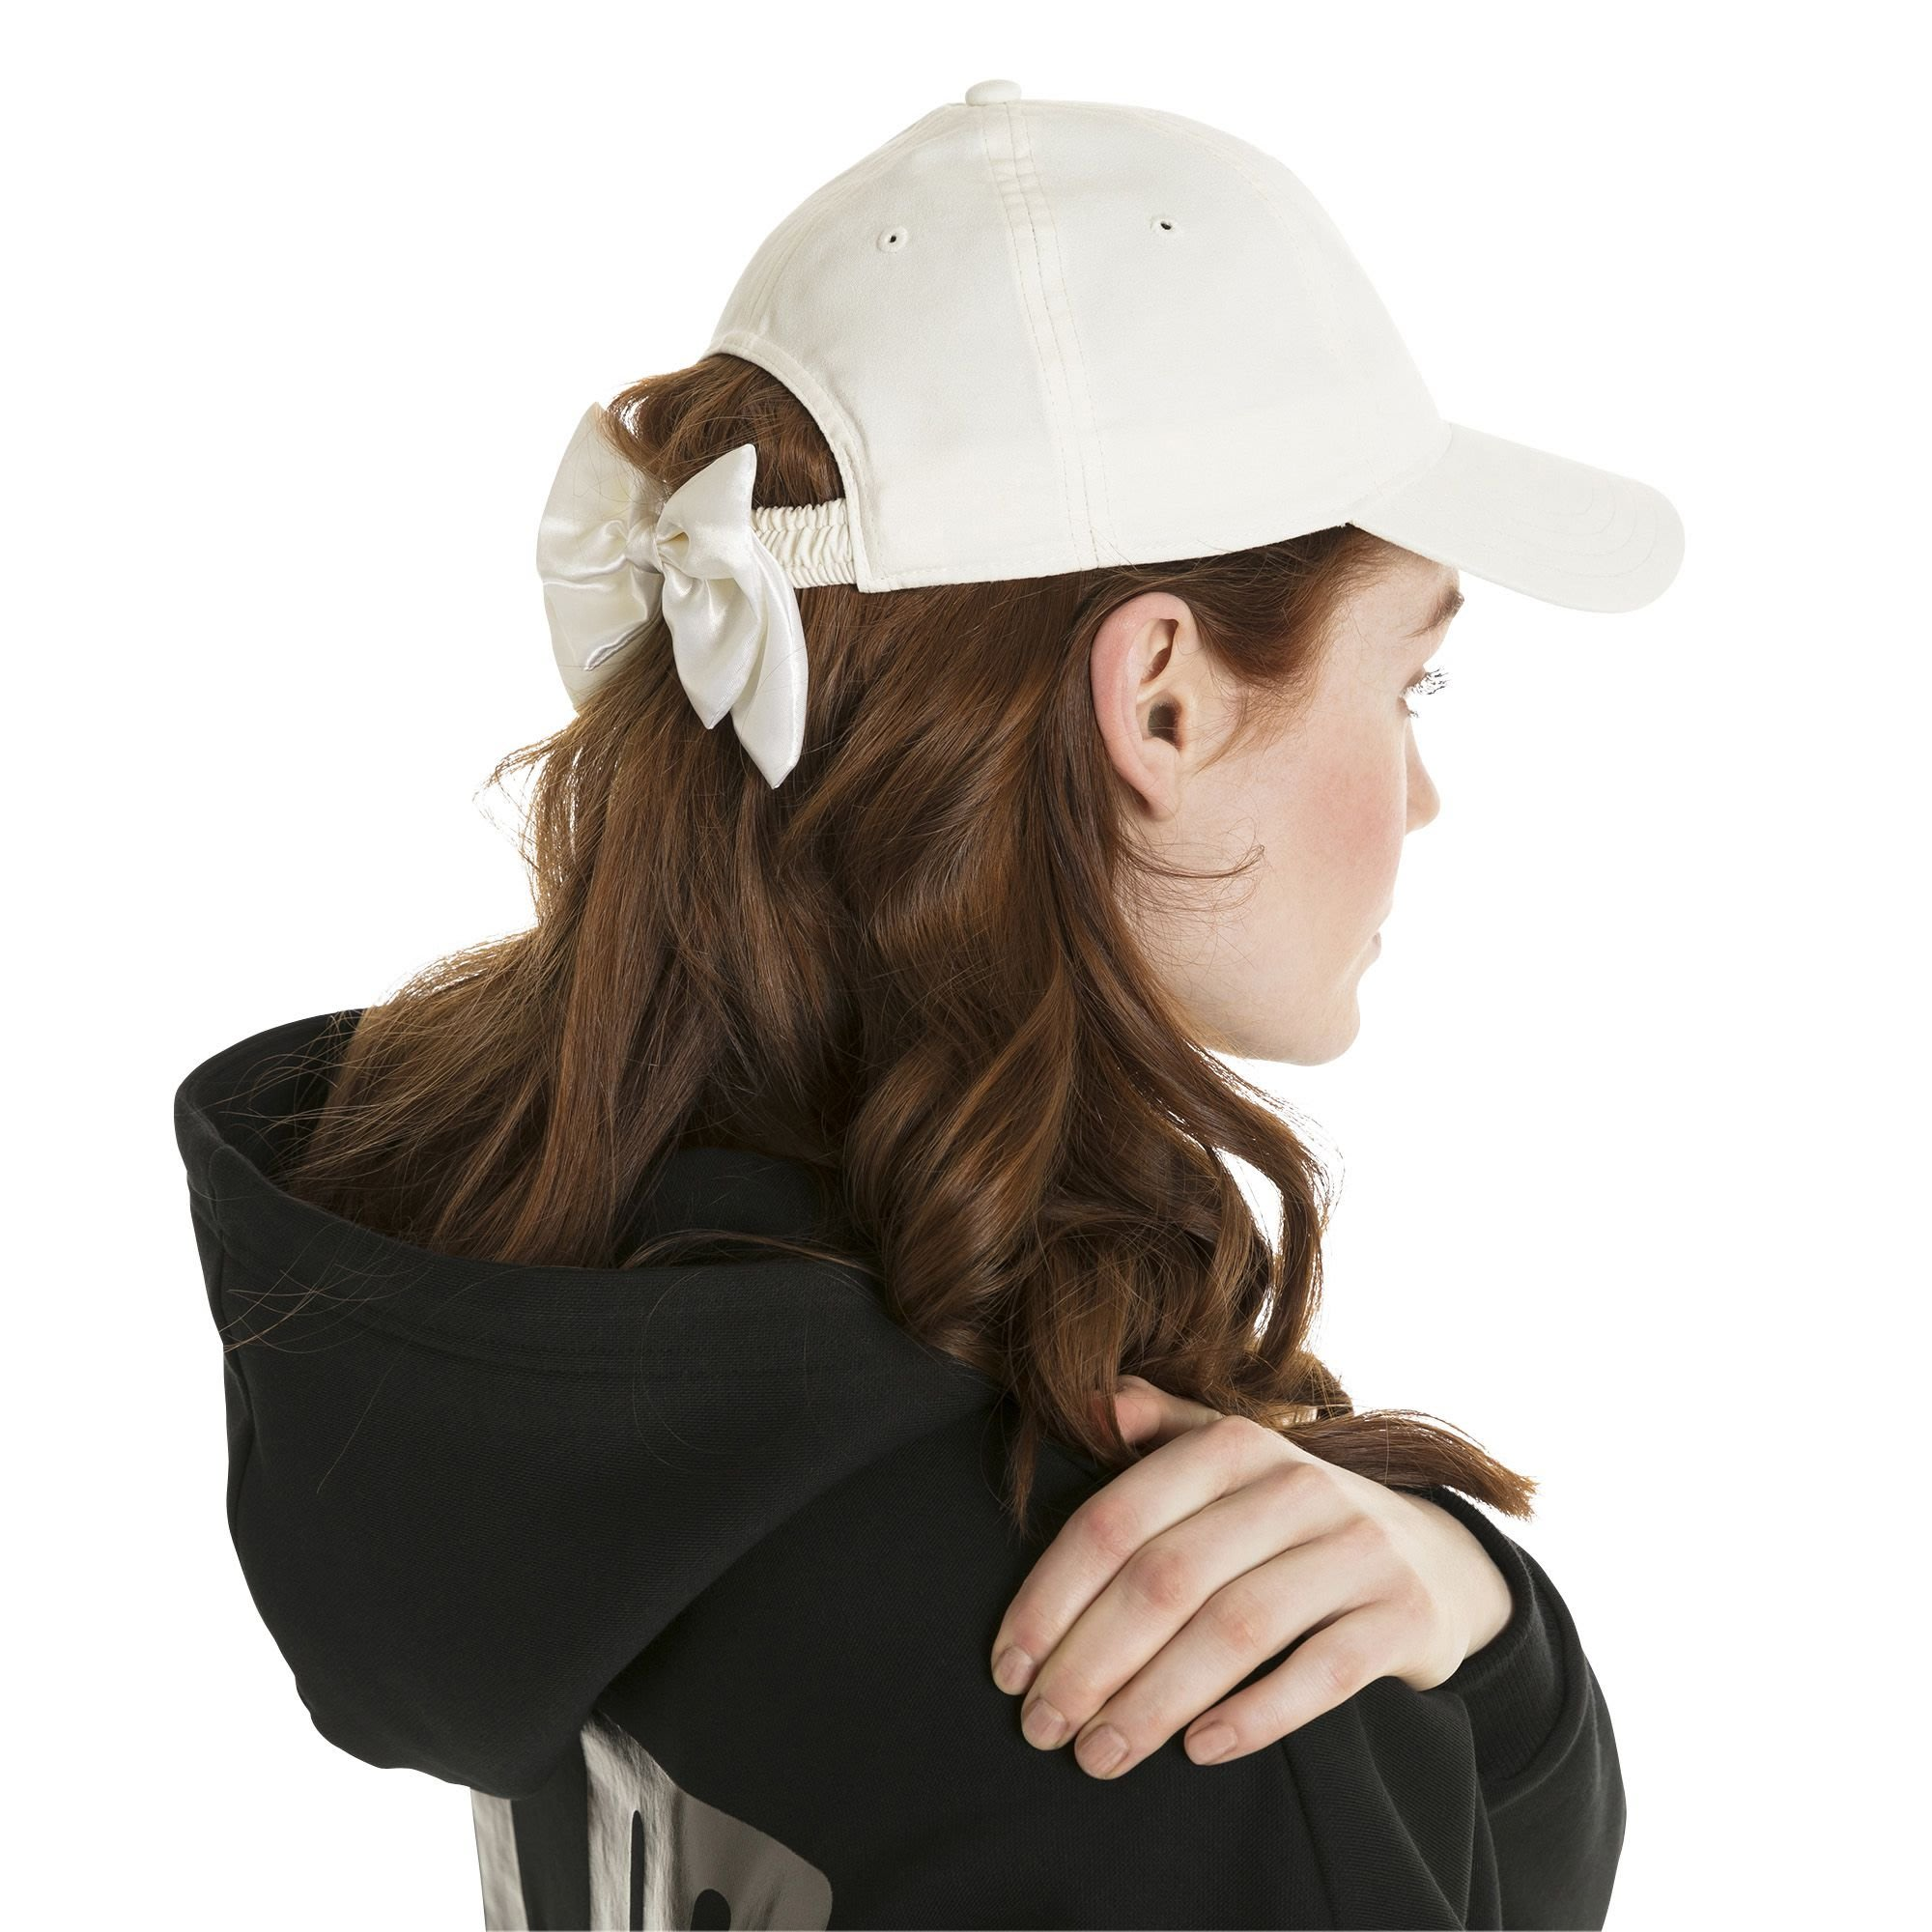 南2018 7月PUMA Bow Hat HEART 愛心緞帶蝴蝶結老帽帽子白色021494-05 ... 74026f54a32